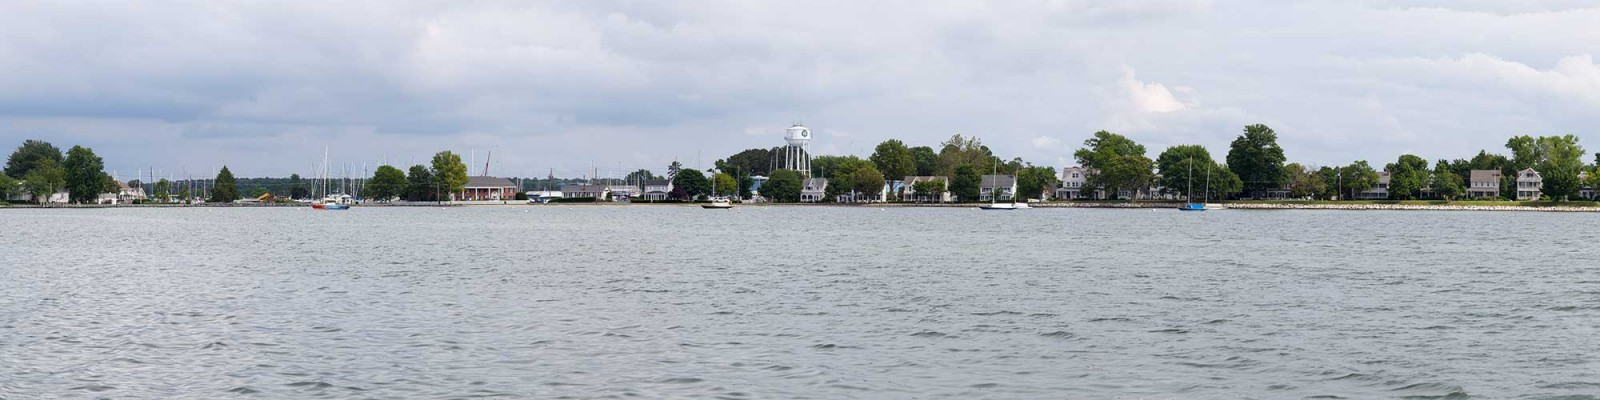 Tenrag Yacht Charter: Chesapeake Bay